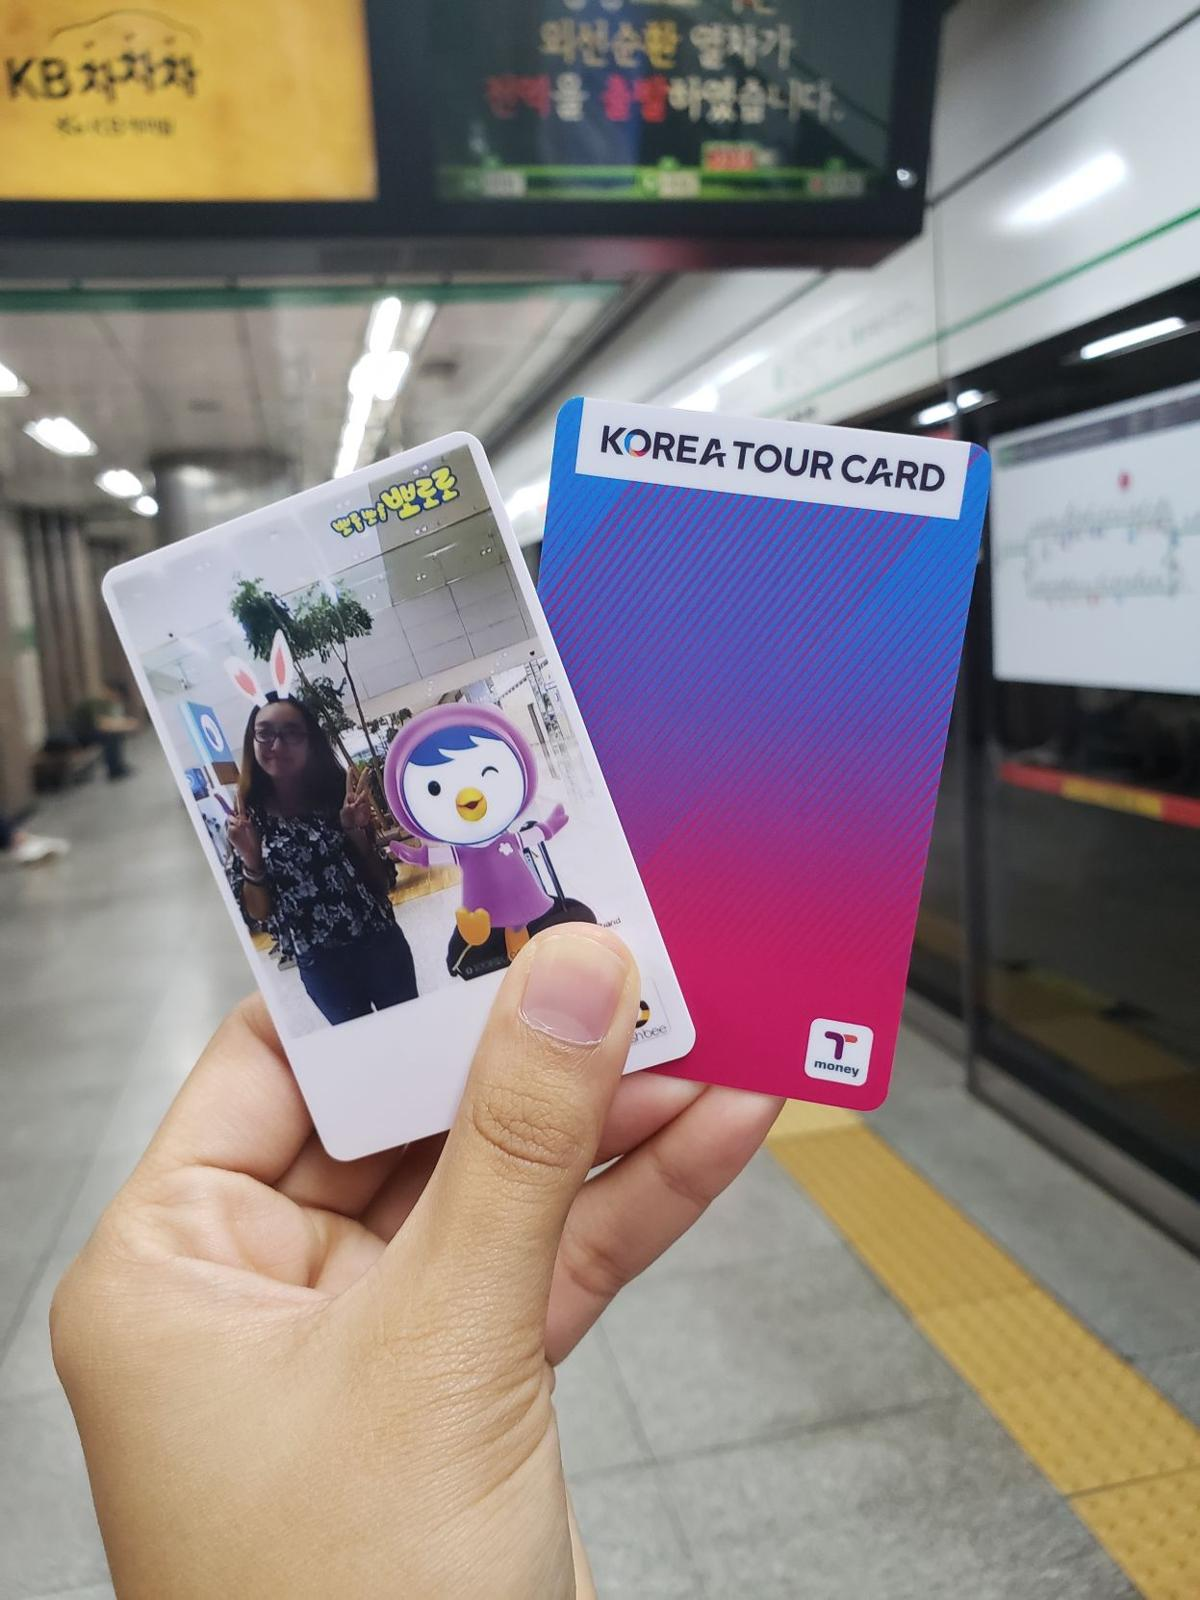 Ka Leo Abroad: Mastering Public Transportation